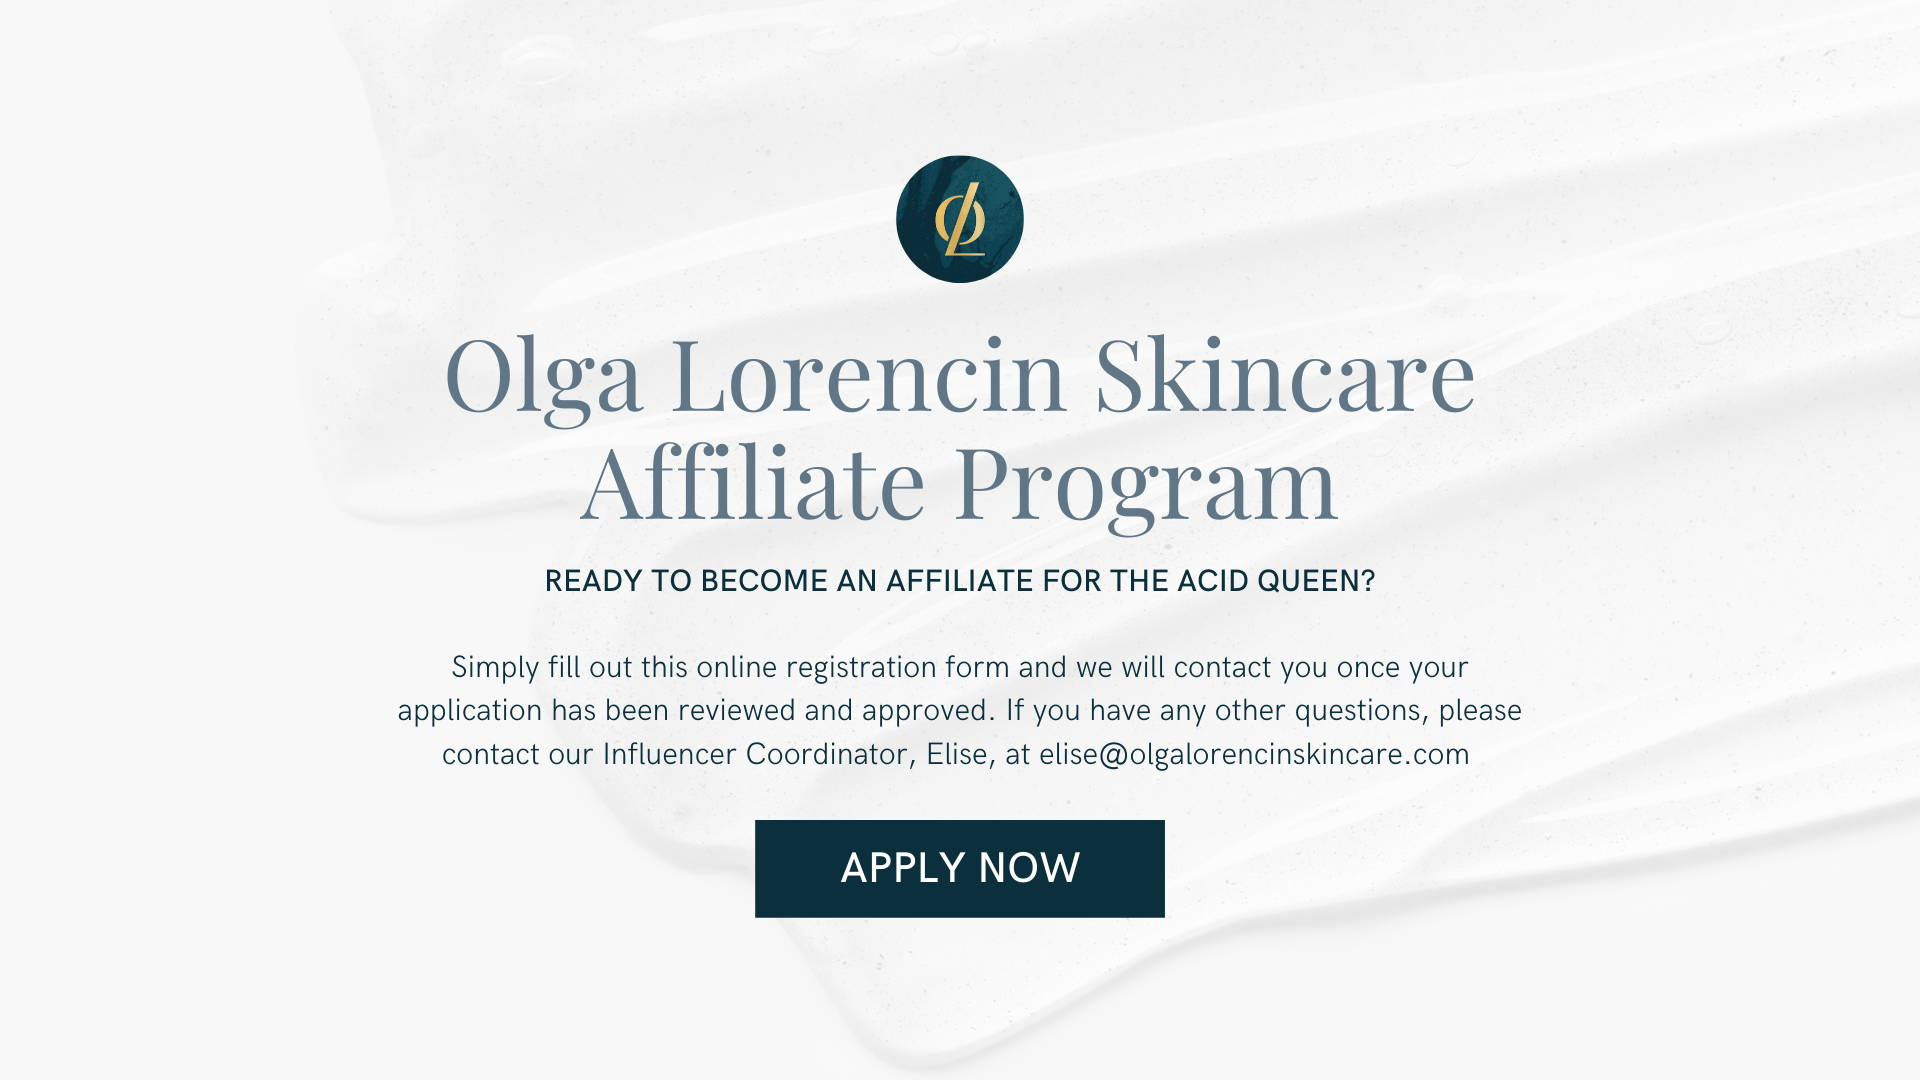 Olga Lorencin Skincare Affiliate Program Join Now